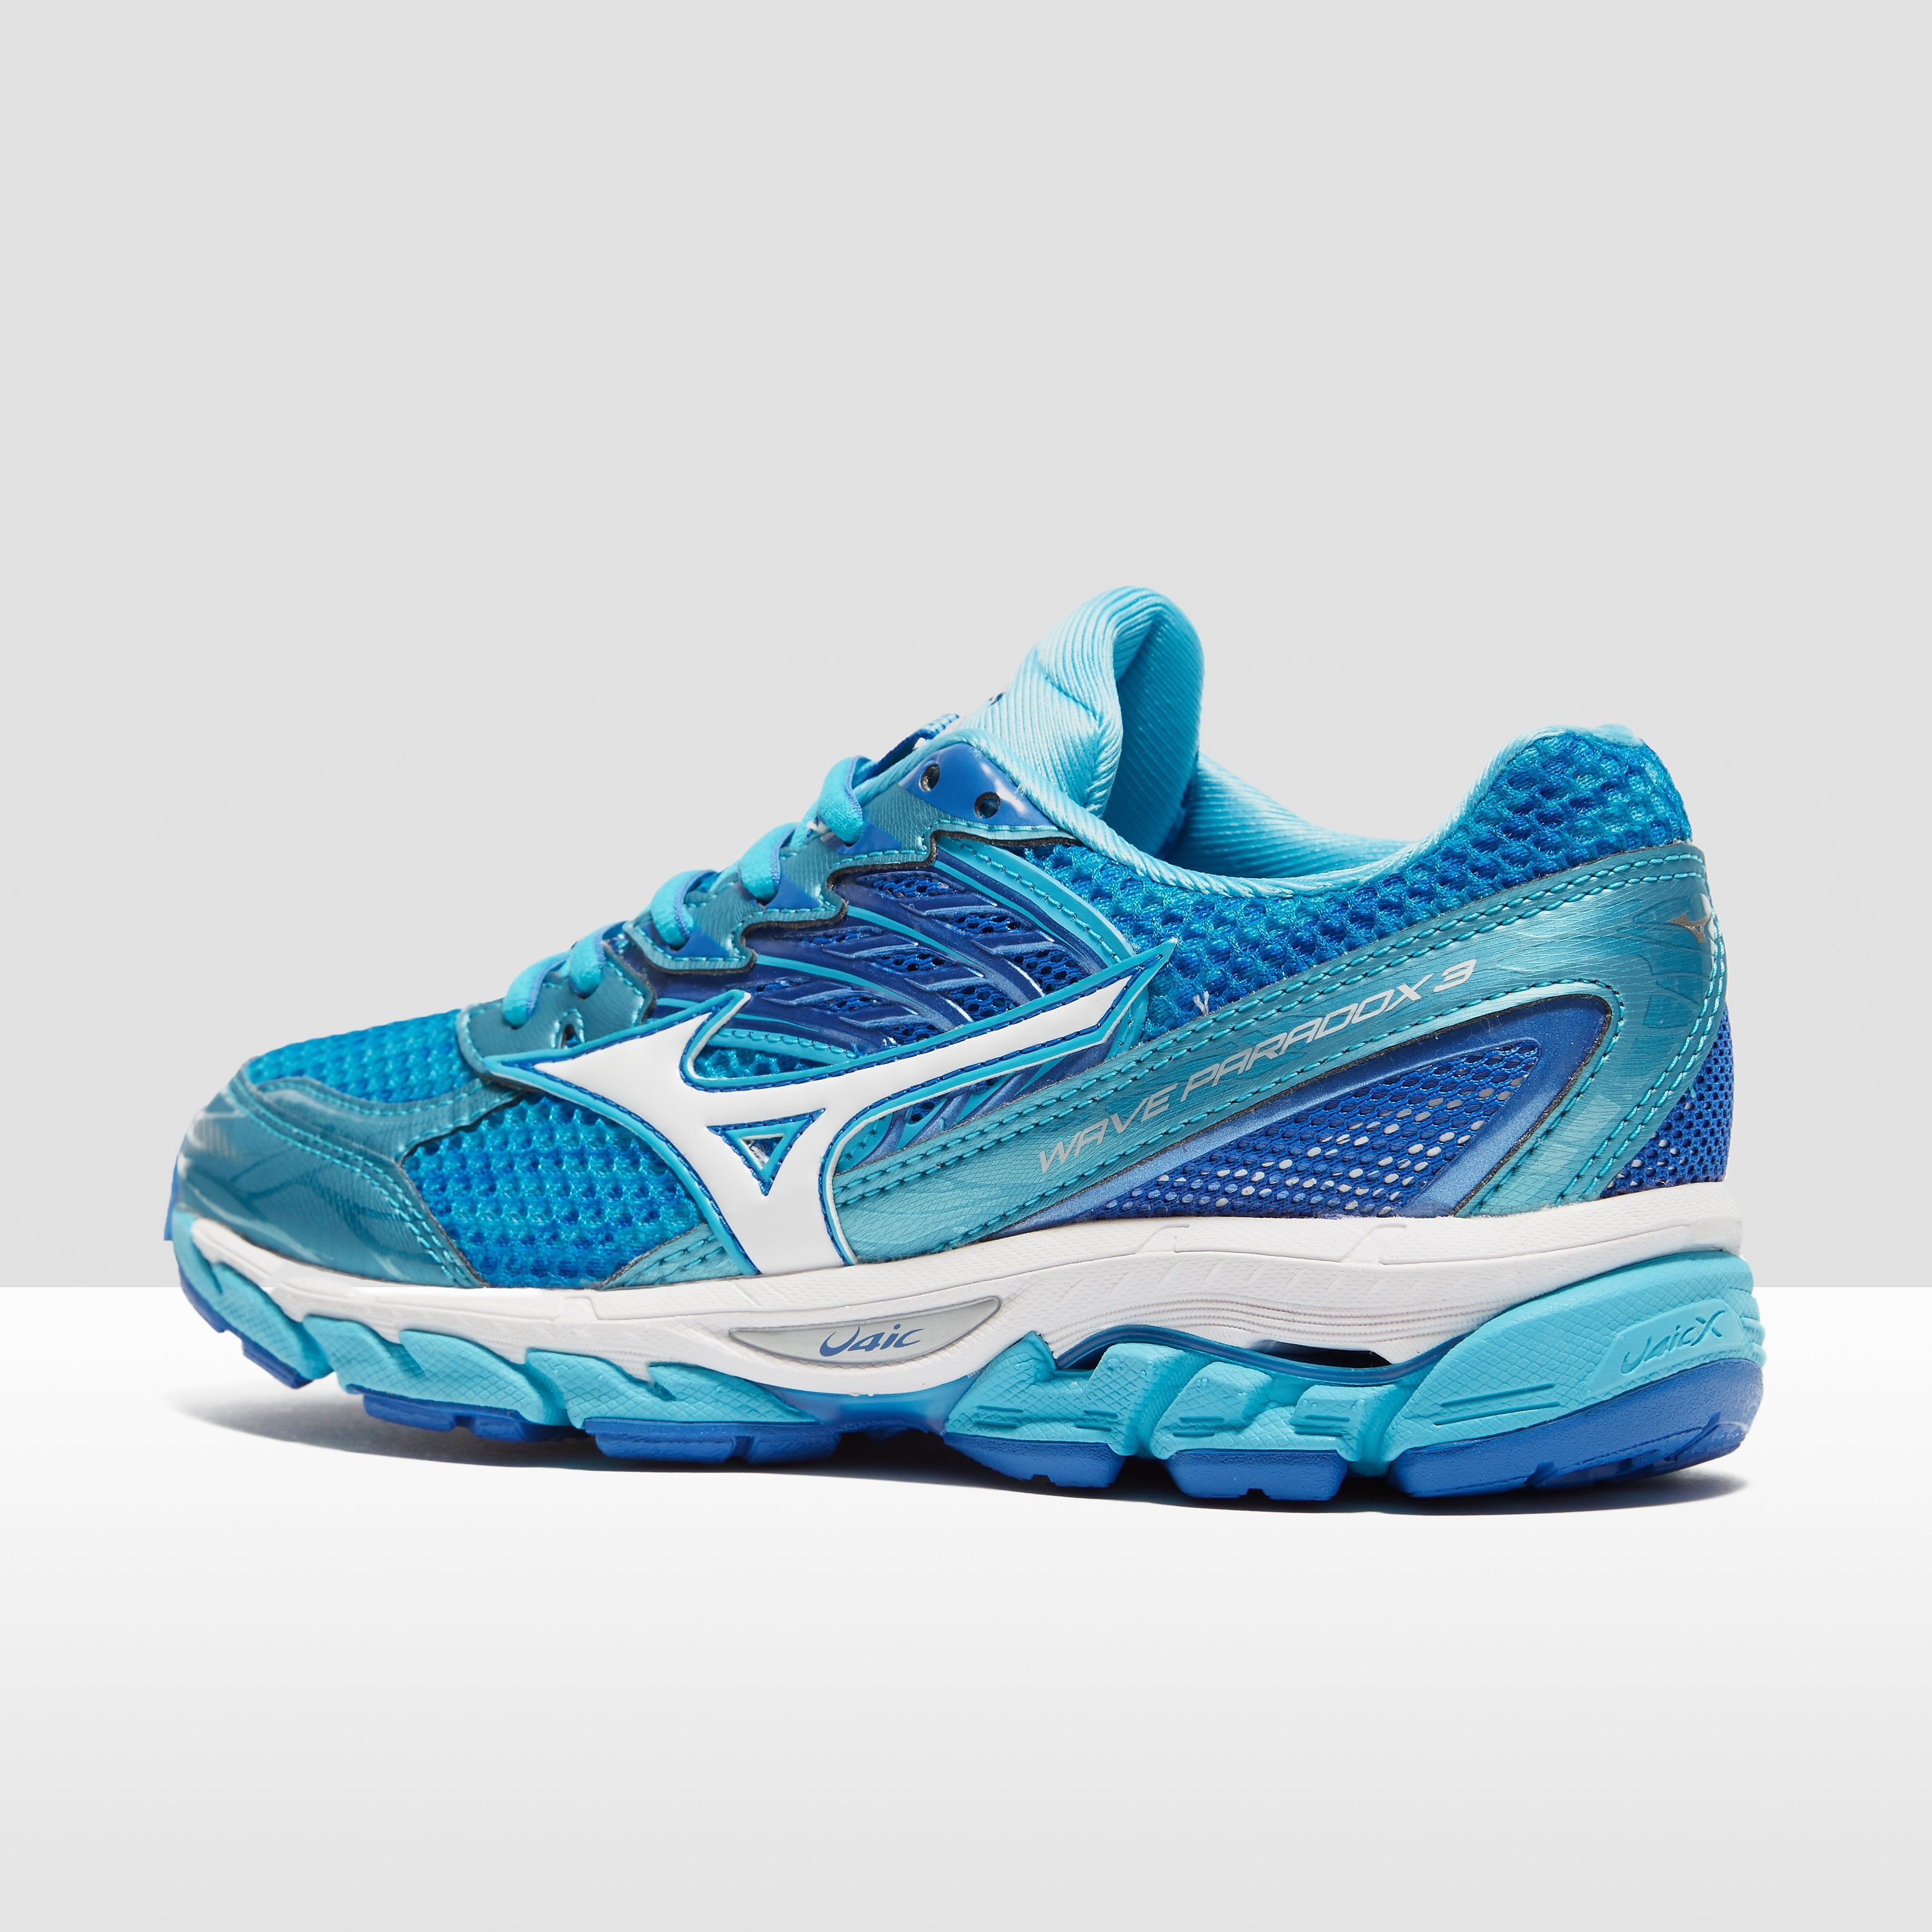 Mizuno Wave Paradox 3 Women's Running Shoes